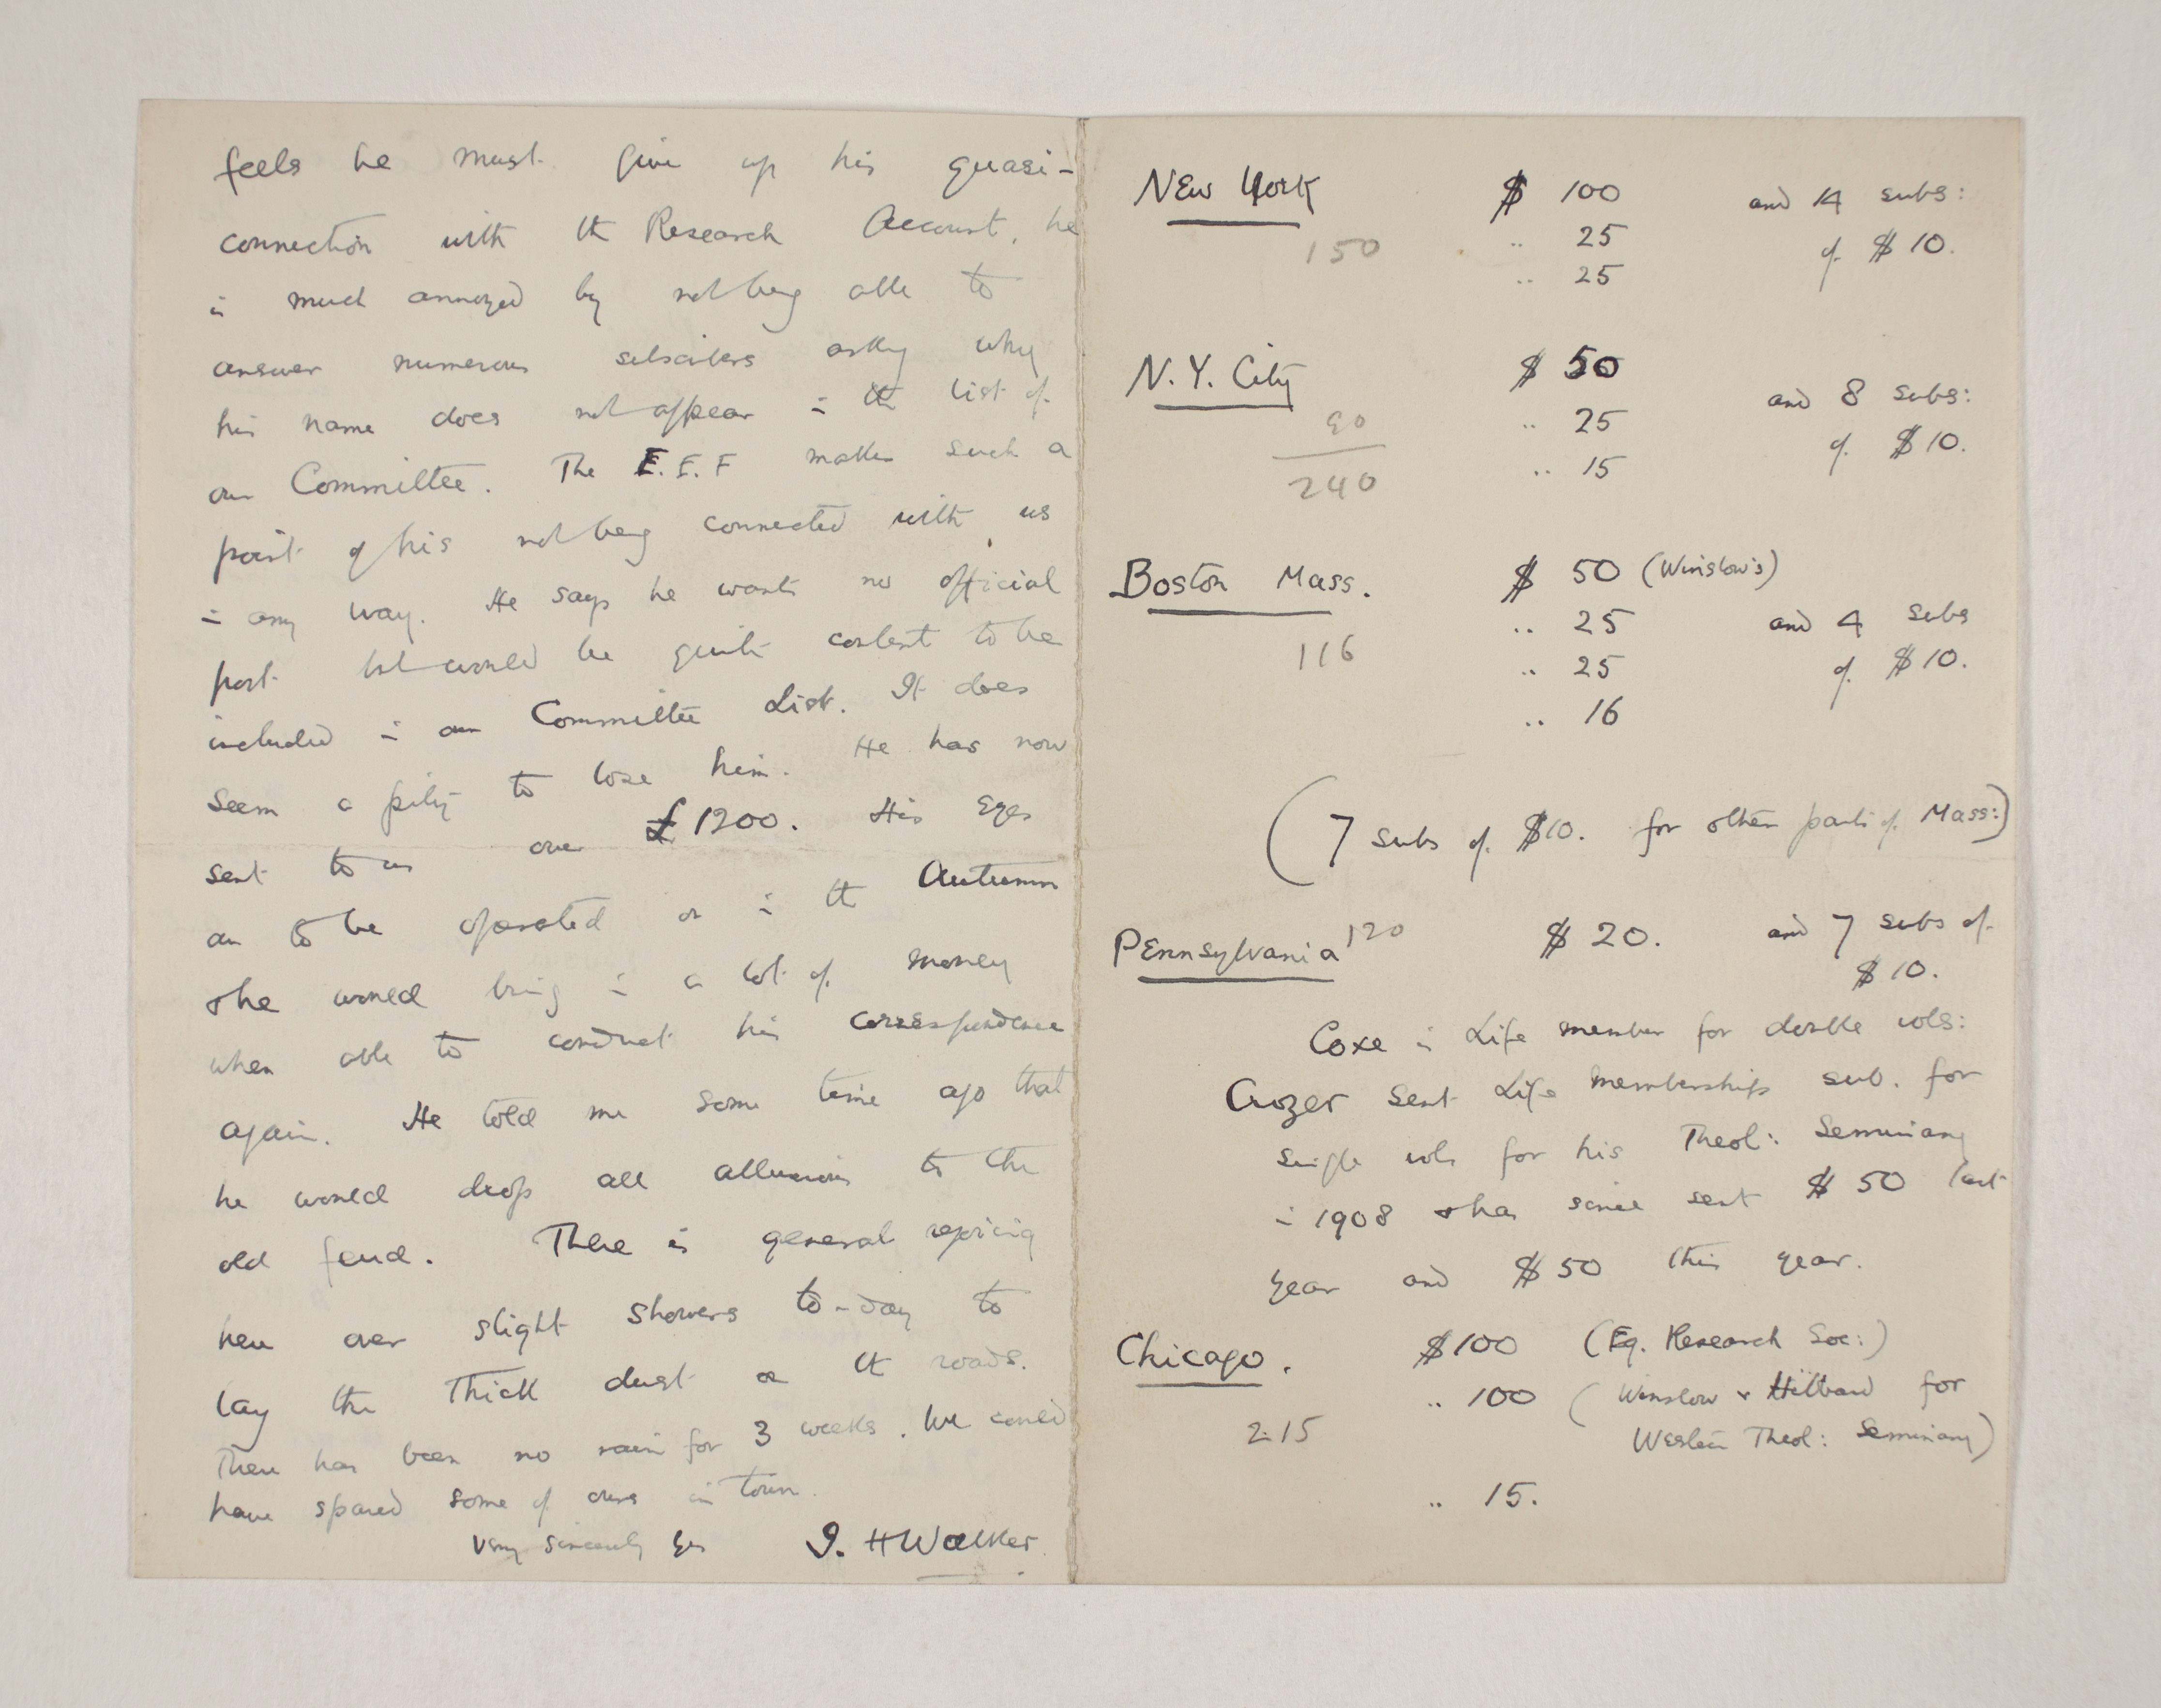 1909-10 Meidum, Memphis Correspondence PMA/WFP1/D/18/12.2